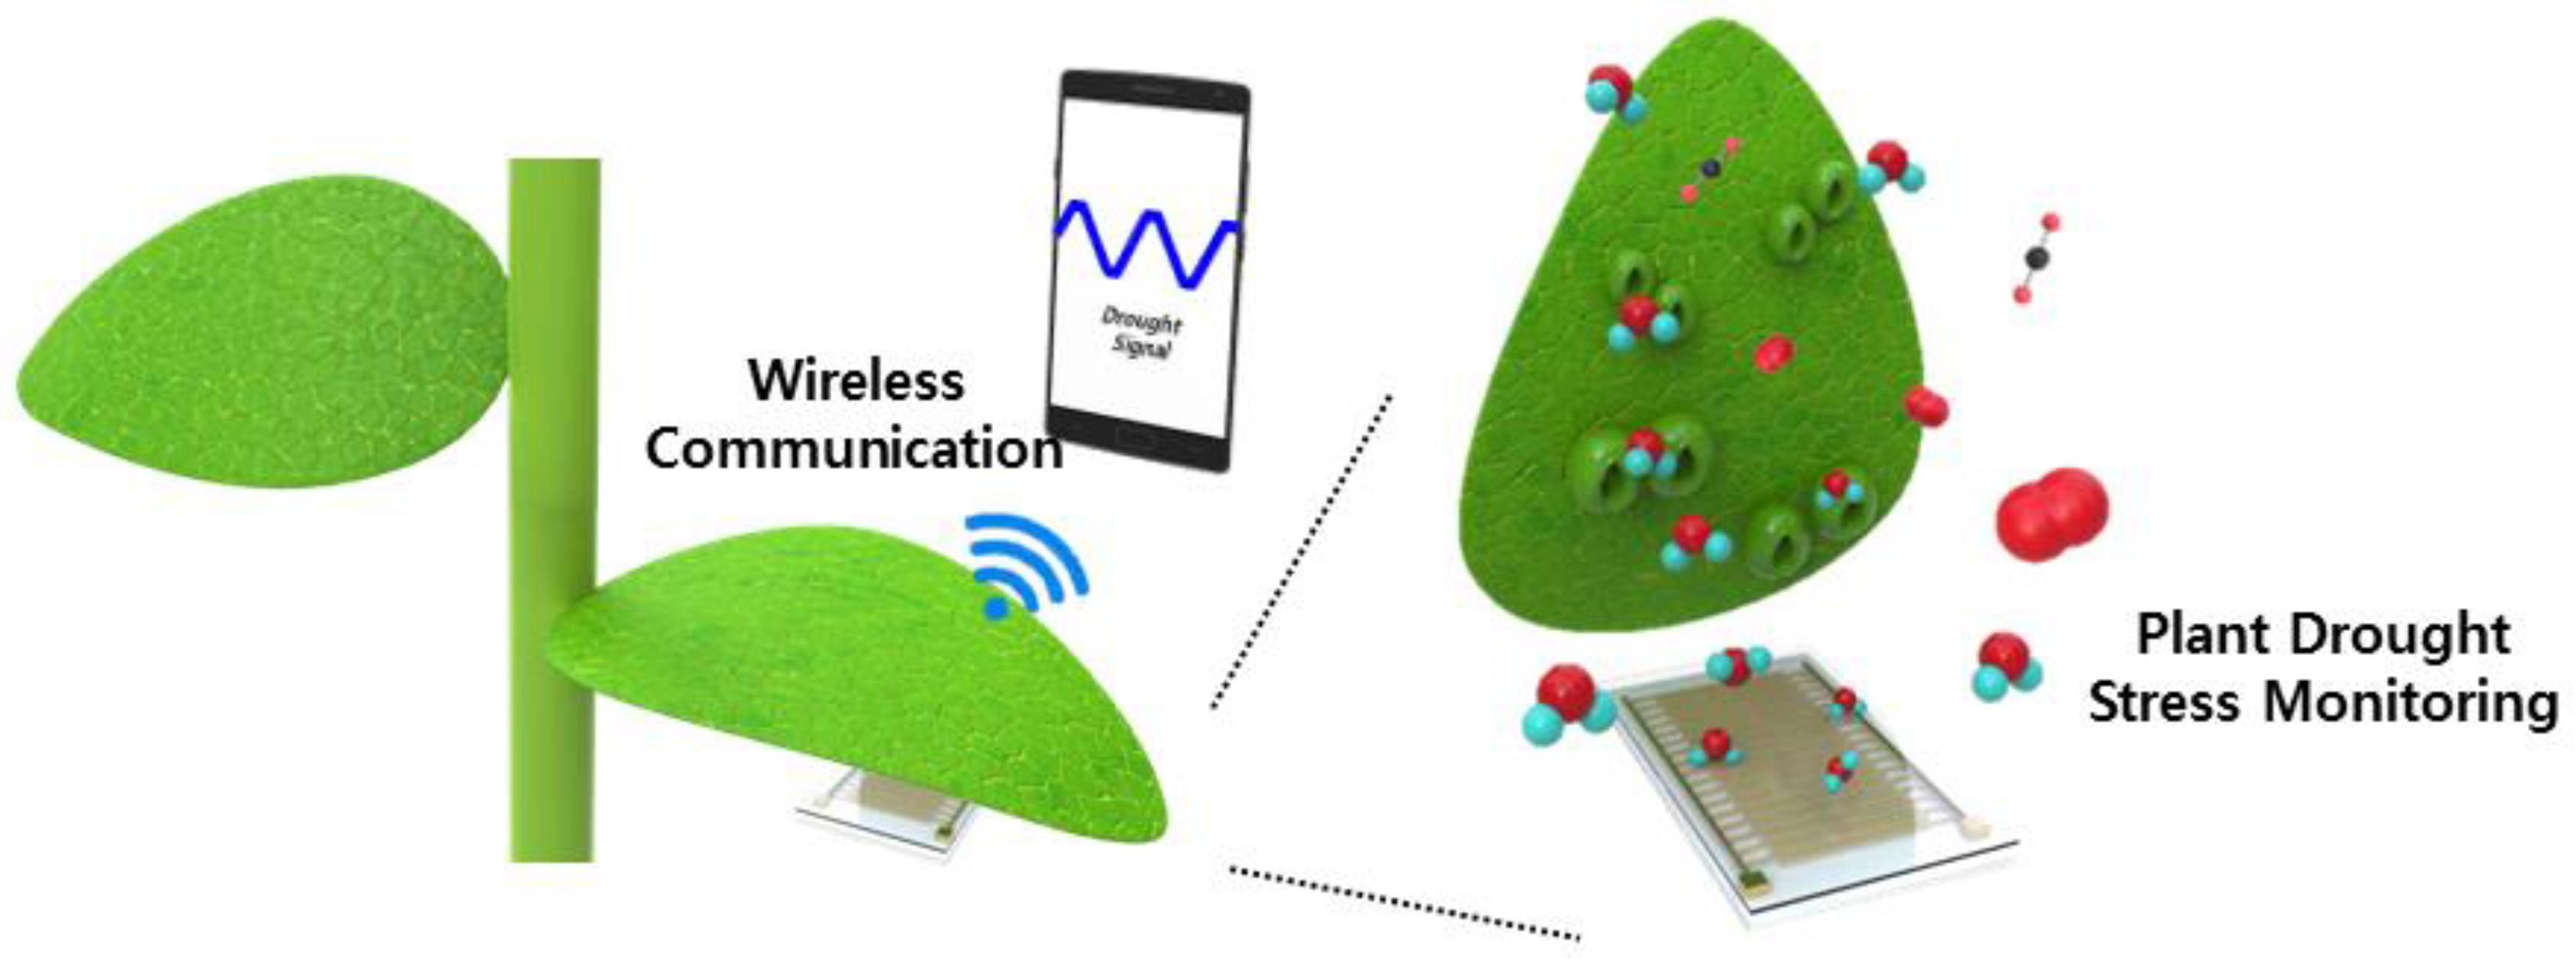 Electronics | Free Full-Text | Flexible PI-Based Plant Drought